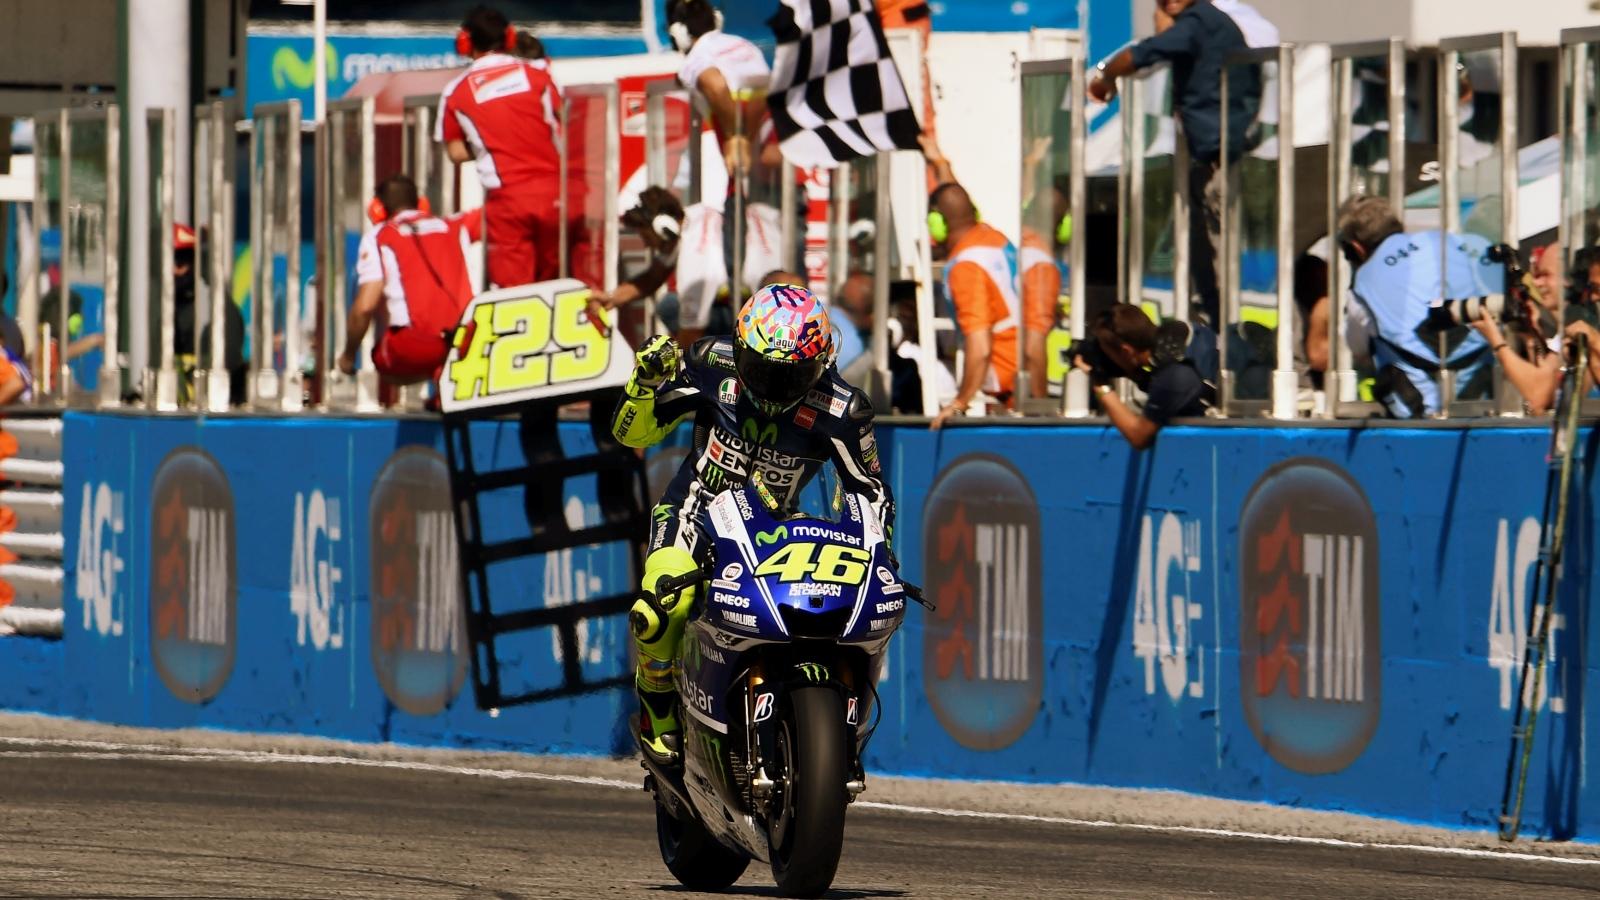 25 años Valentino Rossi: 2014 – Subcampeón MotoGP – Yamaha YZR-M1 / Movistar Yamaha MotoGP